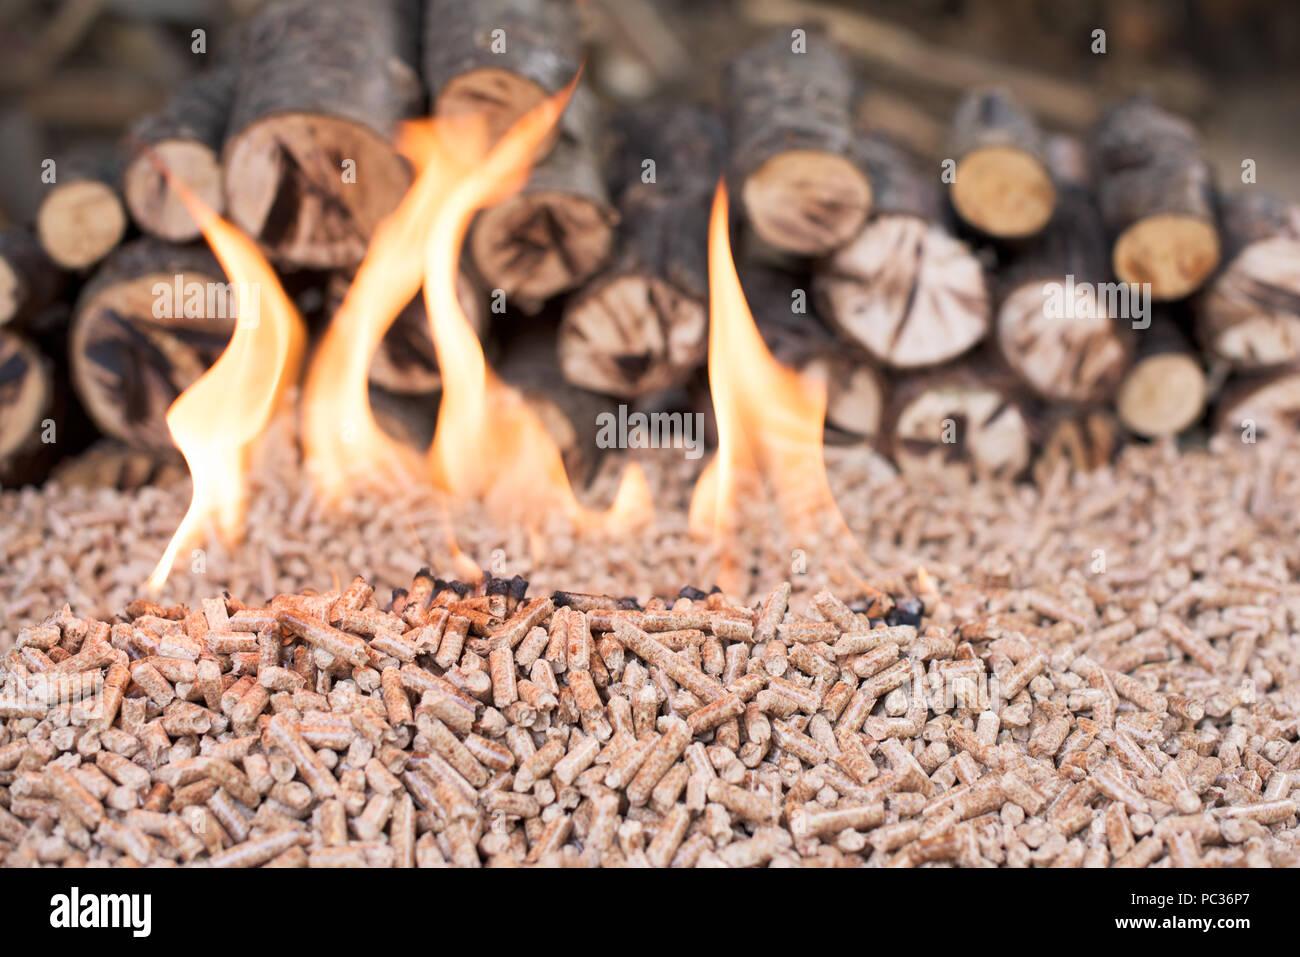 Pile of Oak wooden pellets in flames - Stock Image